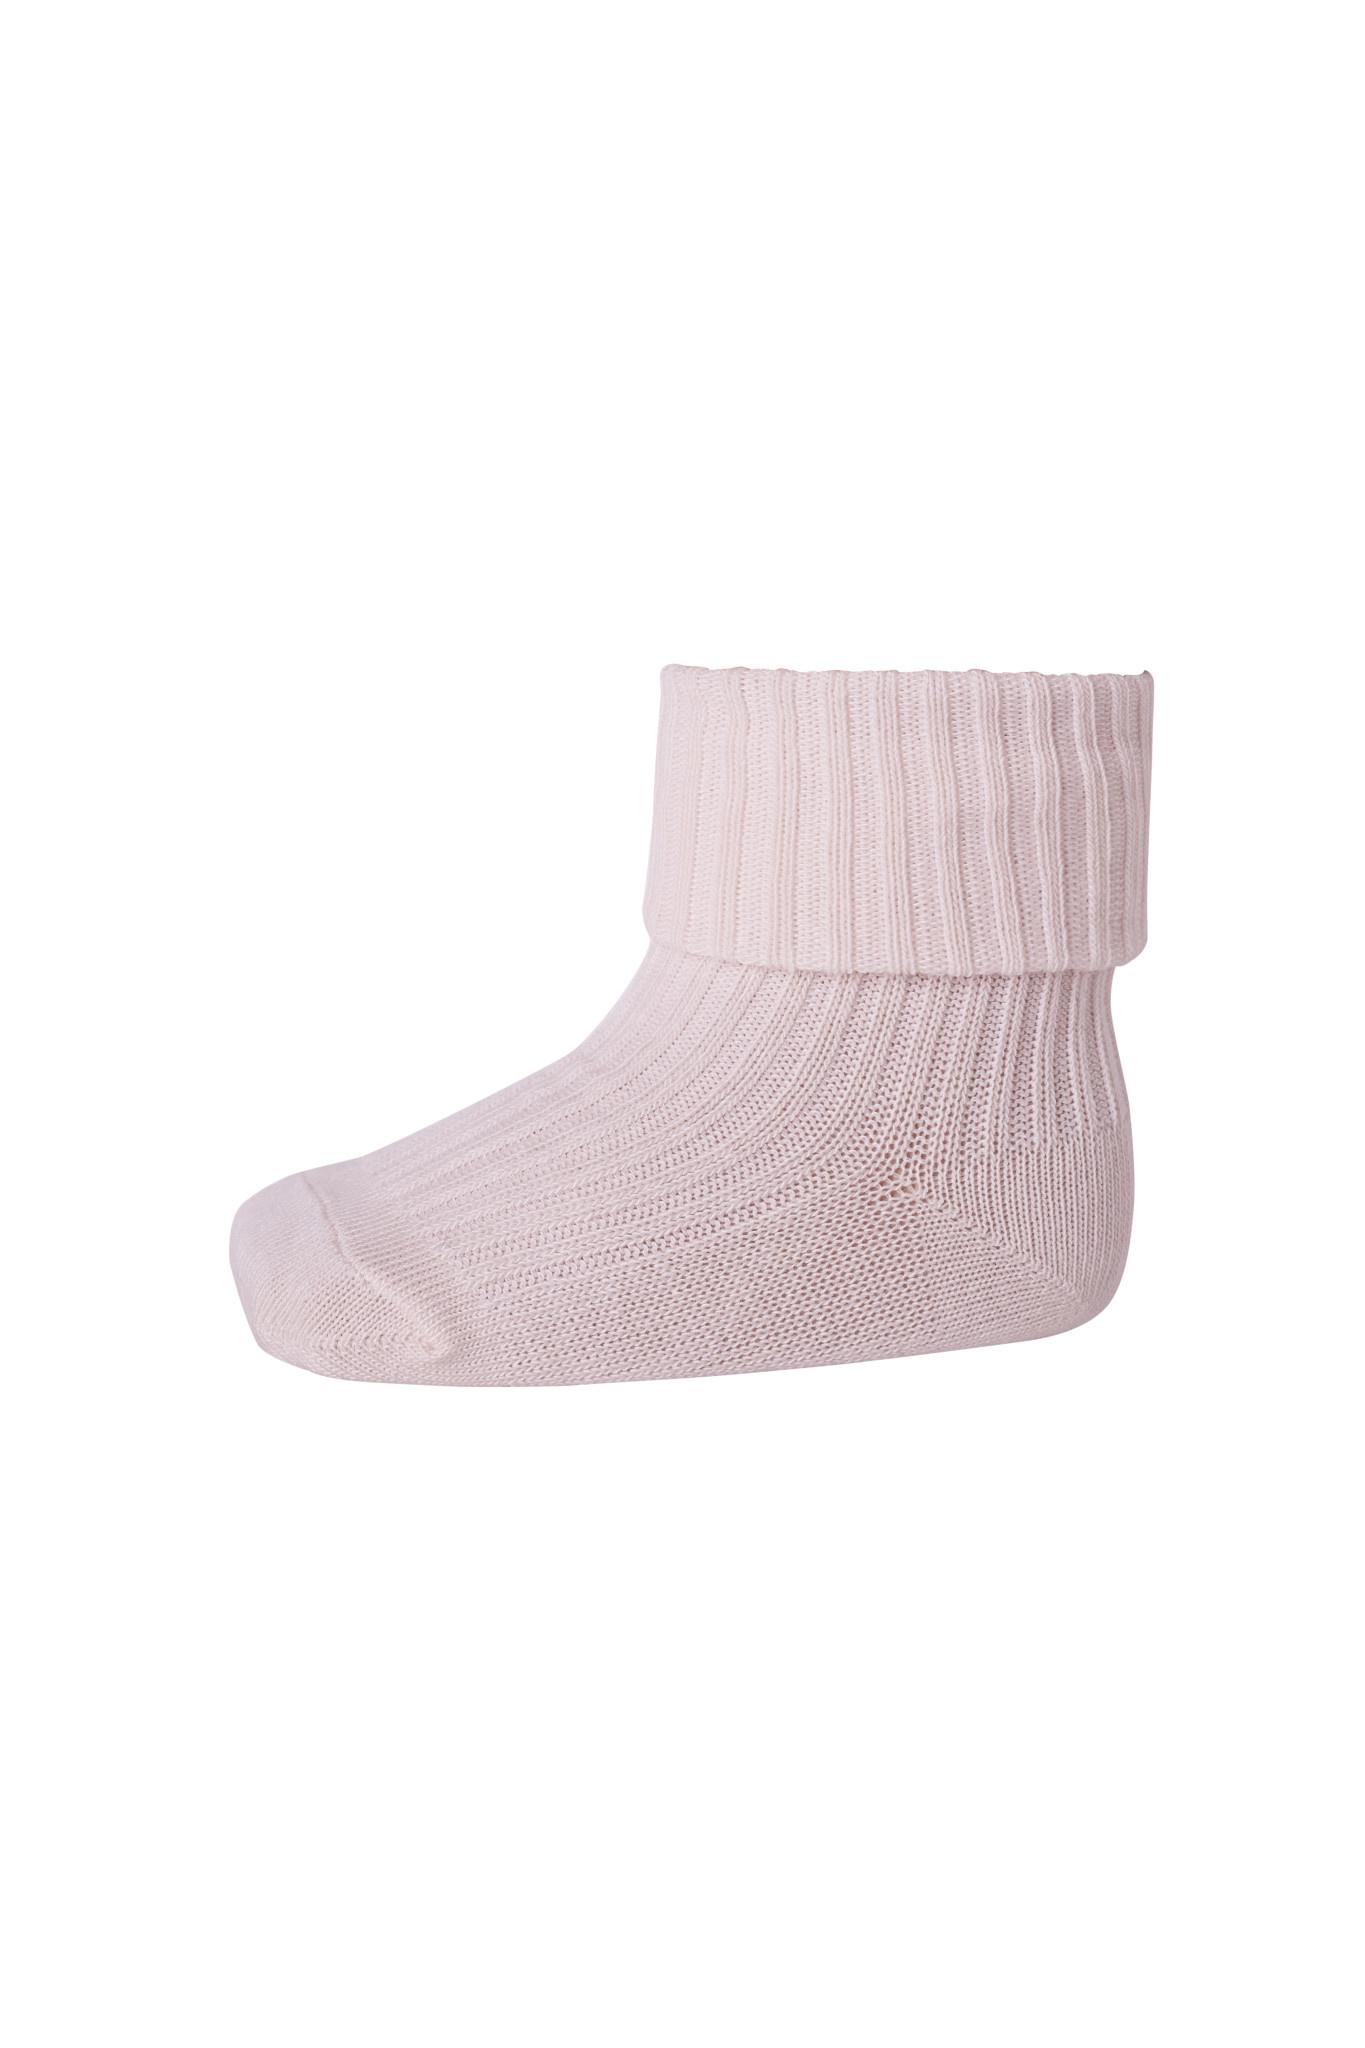 MP Denmark cotton rib sokjes - 870 rose grey-1